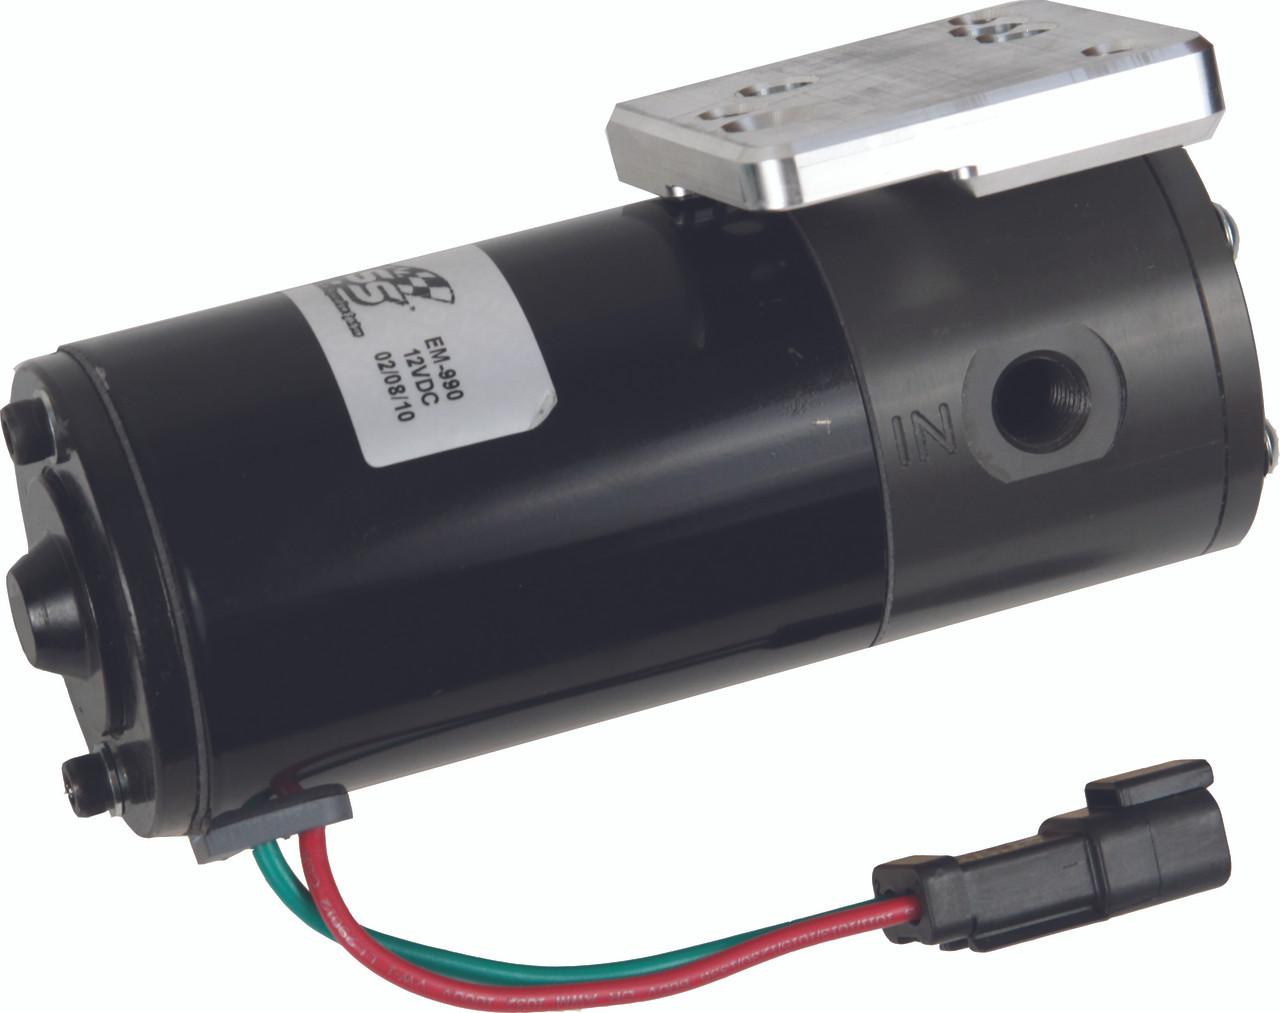 hight resolution of dodge ram cummins drp series diesel fuel pump by fass fuel systems